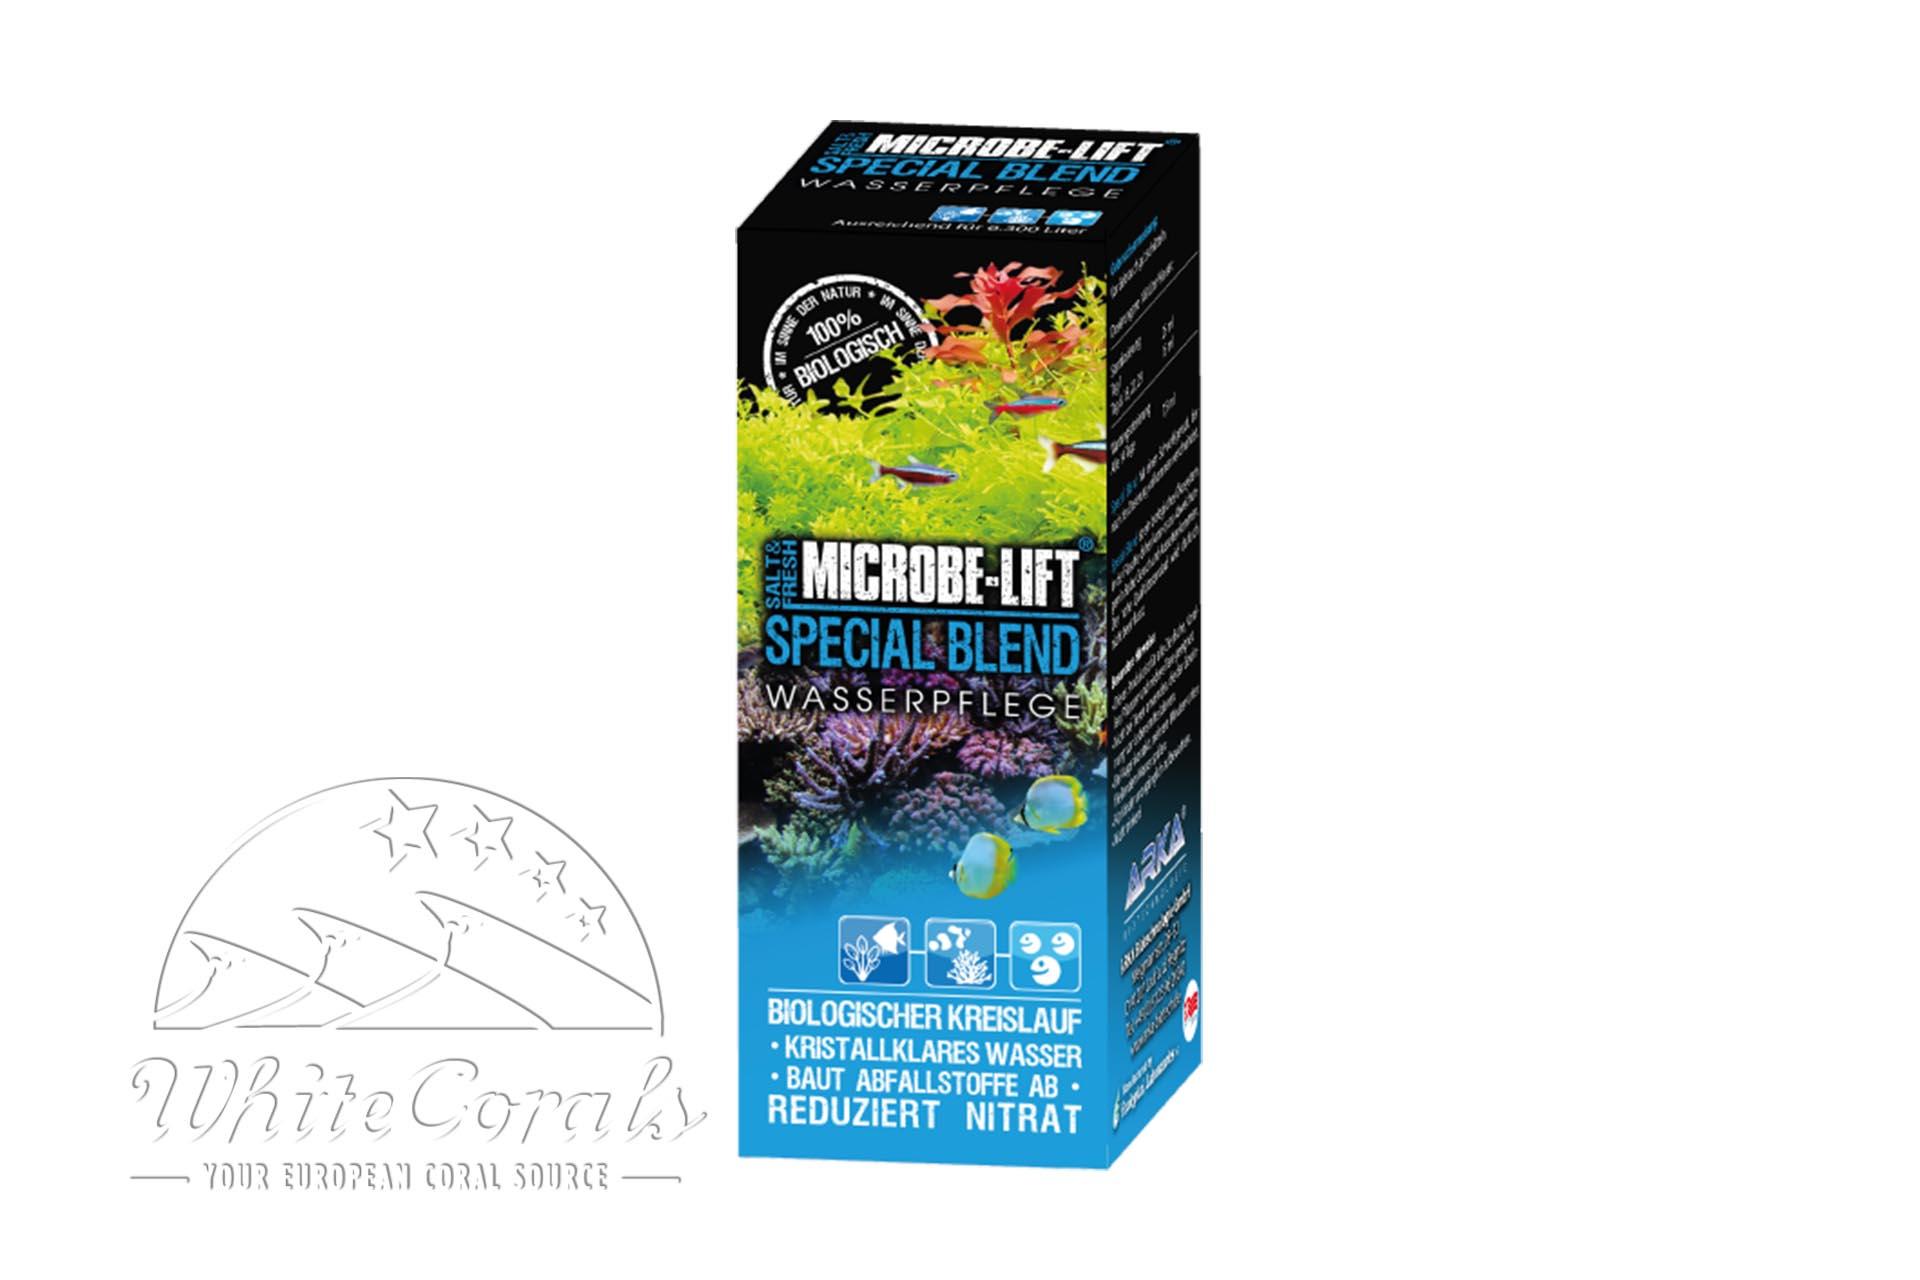 Microbe-Lift Special Blend 251 mL (8 oz.)